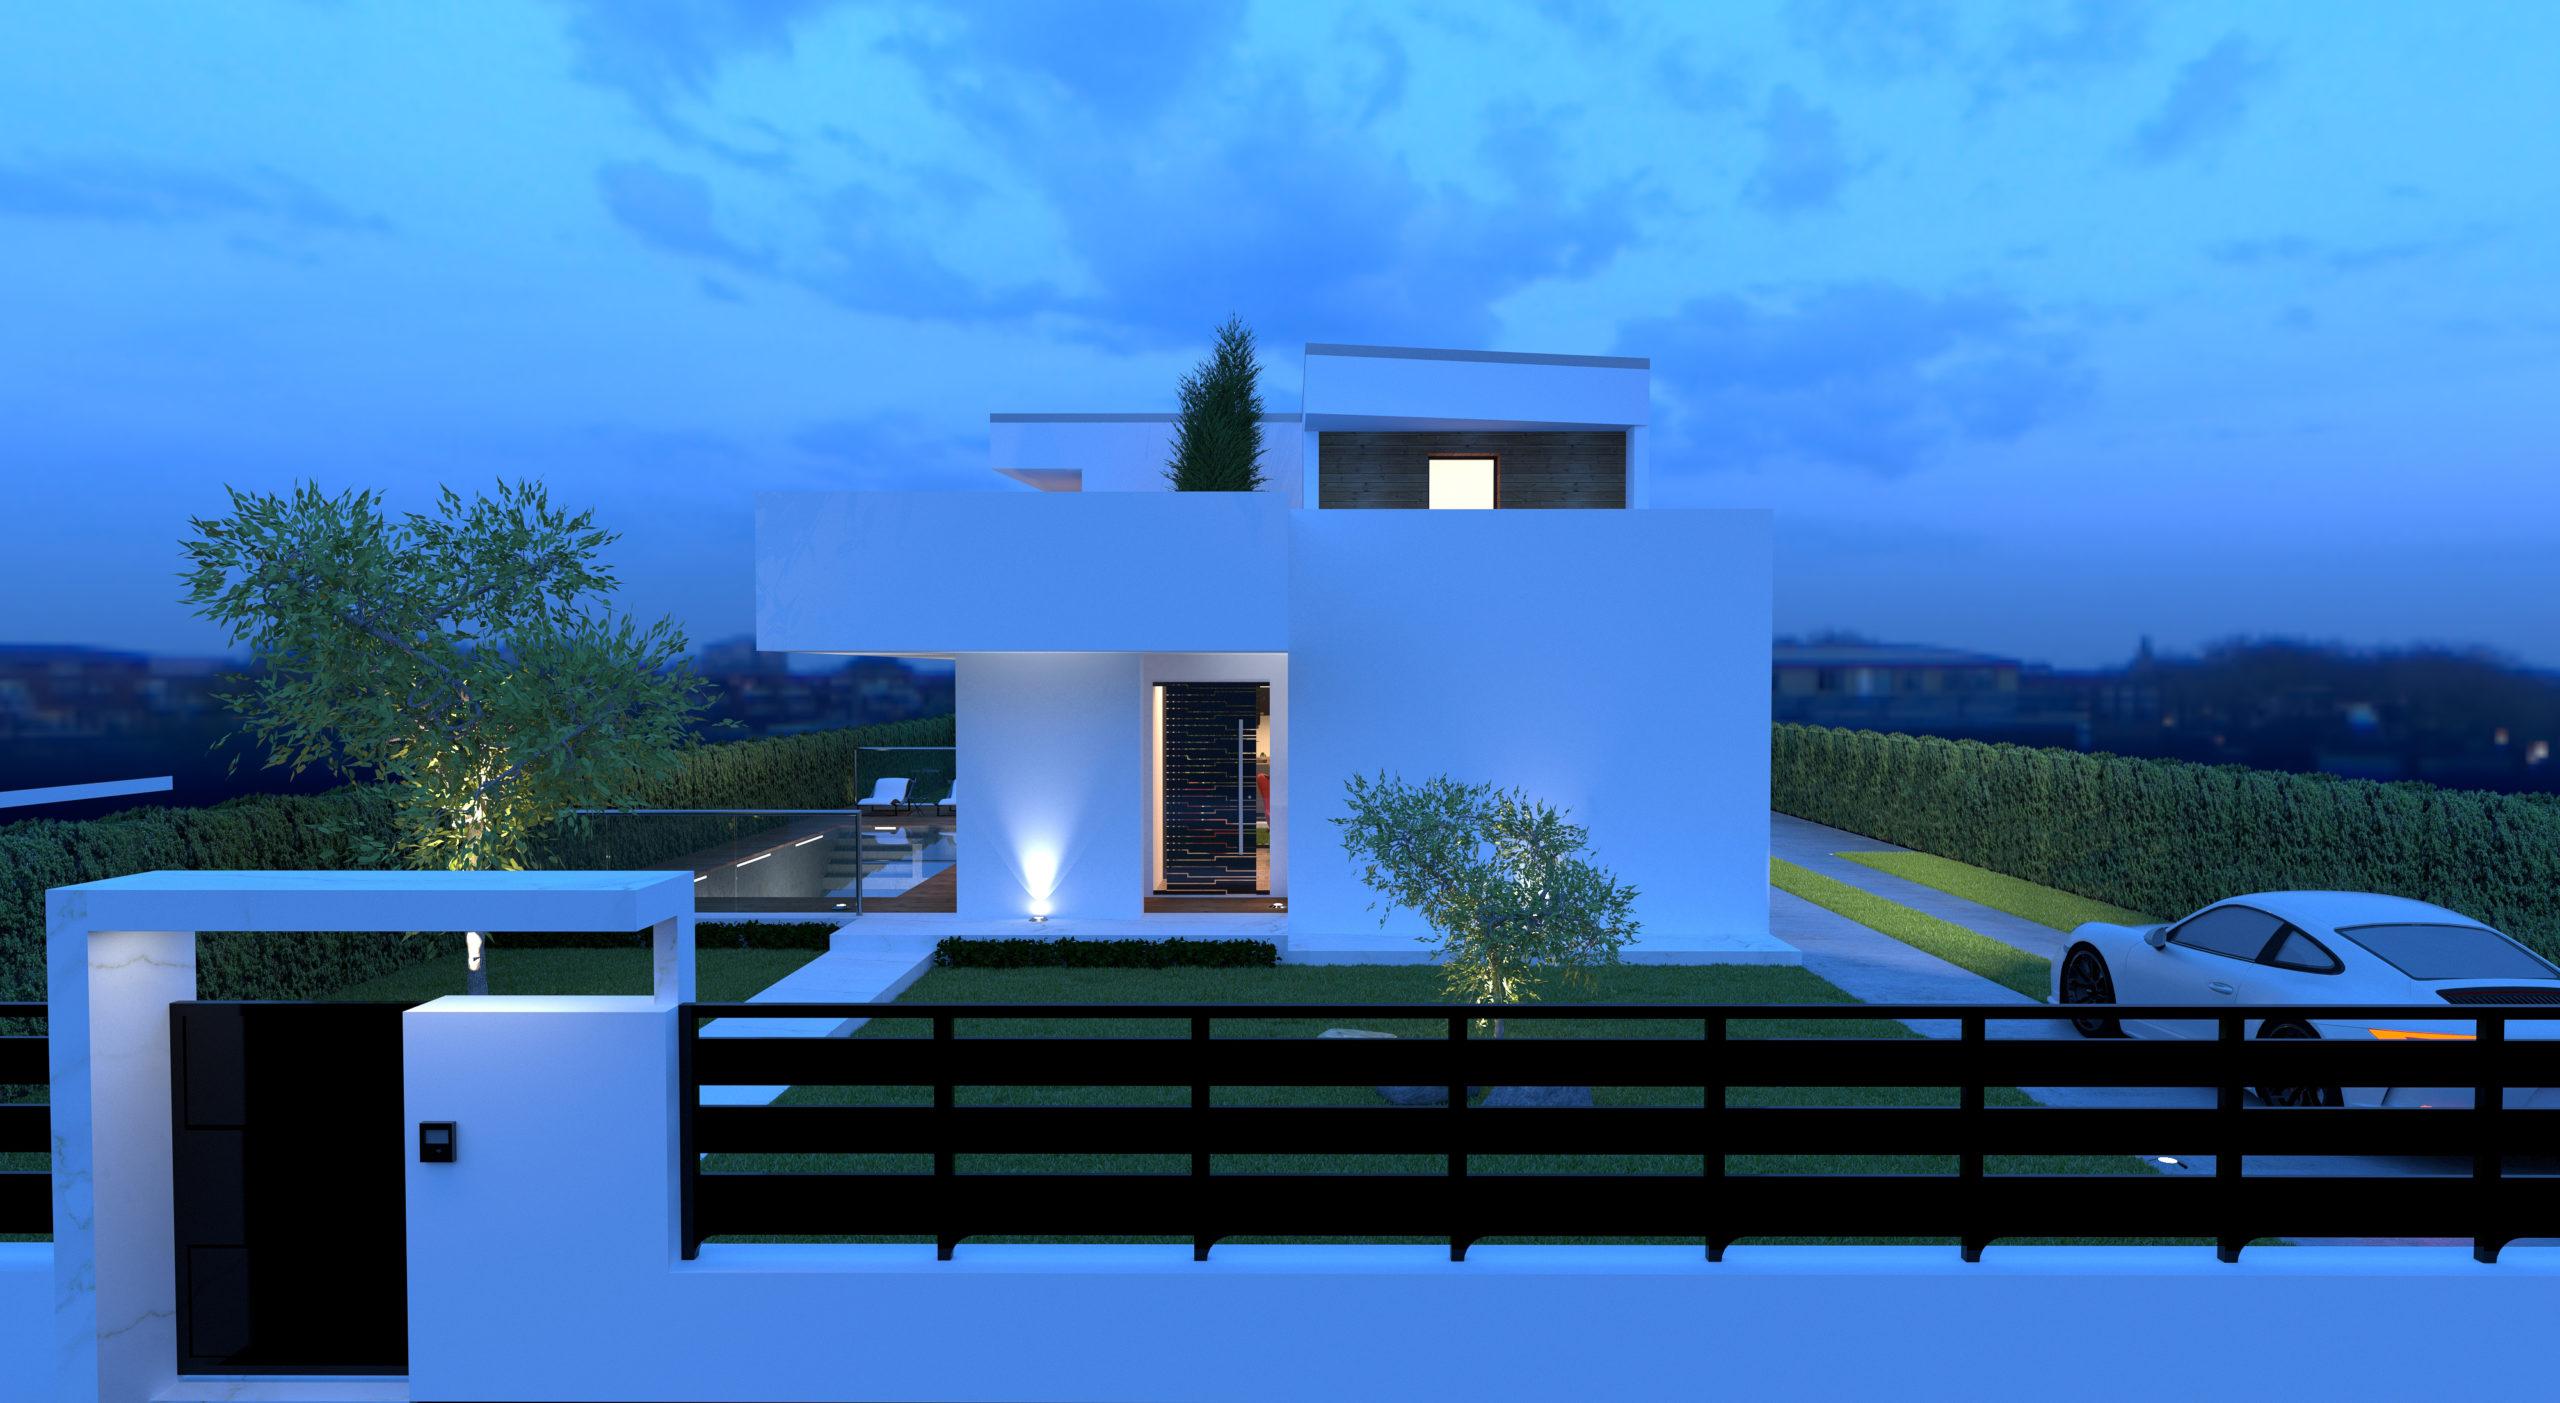 elia-mischiatti-ingegneria-architettura-rendering-villa-moderna-01